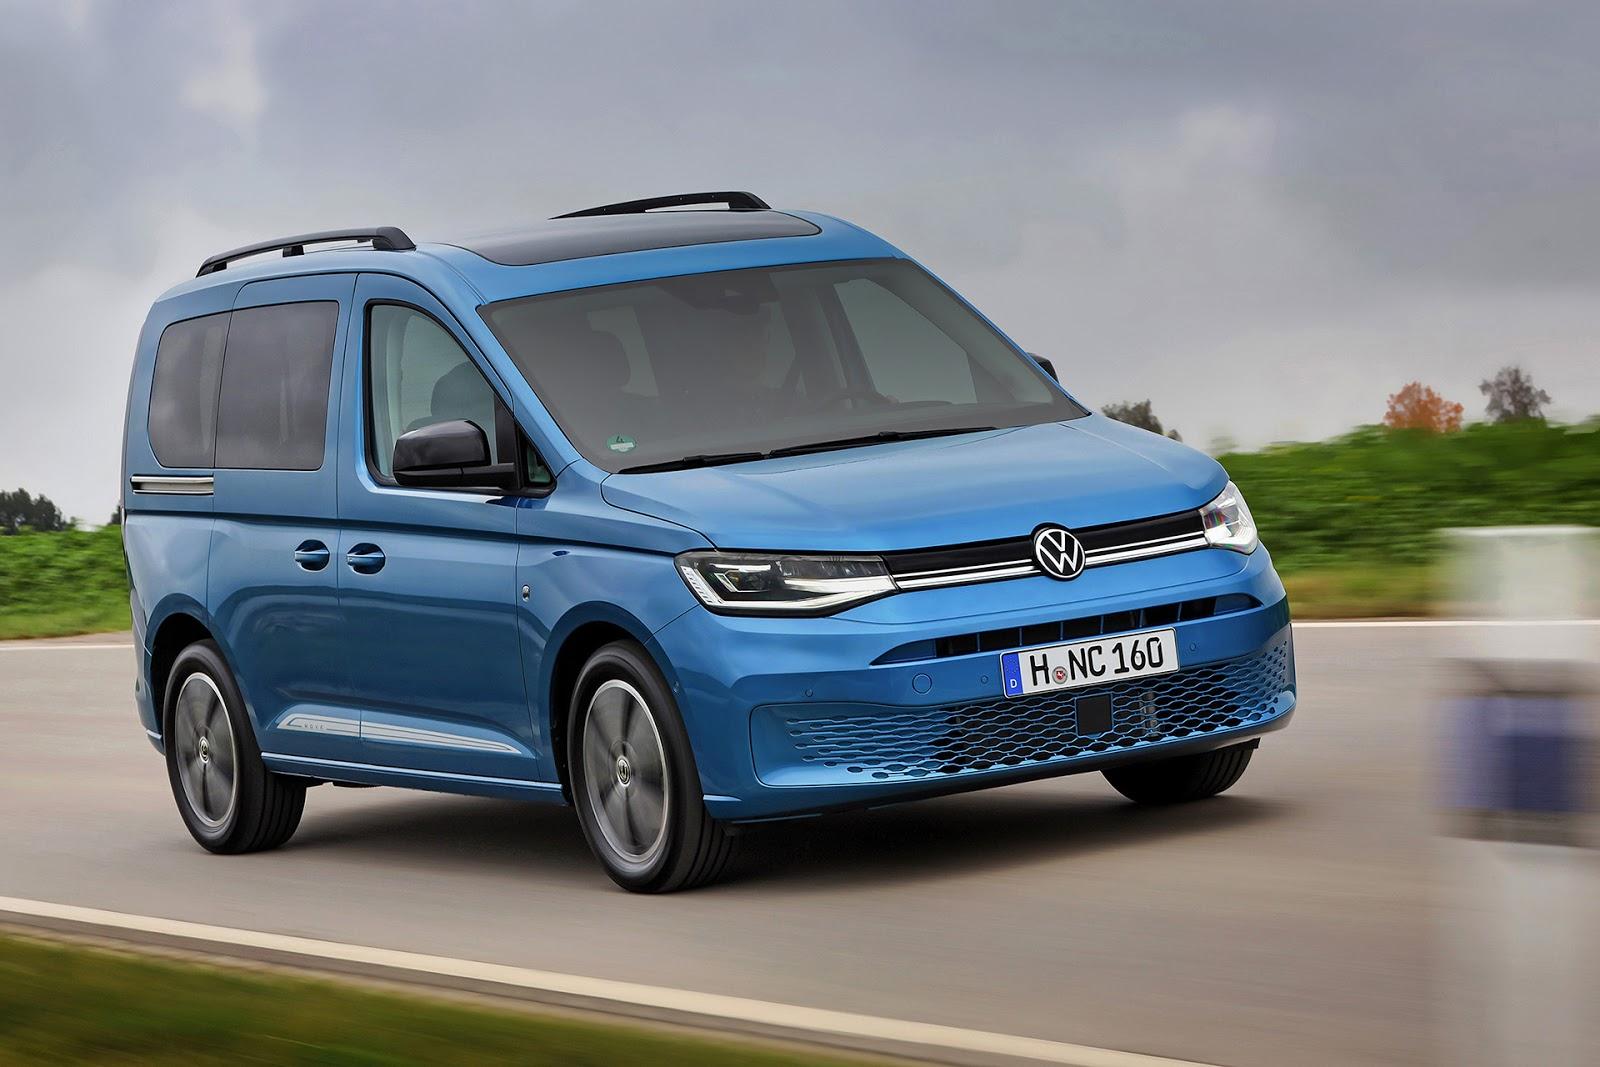 NEO2BVOLKSWAGEN2BCADDY2B5 5 2 Νέο Volkswagen Caddy 5: μεγαλύτερο, πρακτικότερο, αποδοτικότερο, εξυπνότερο Caddy, MPV, Volkswagen, Volkswagen Caddy, VW, VW Caddy, ειδήσεις, Επαγγελματικά